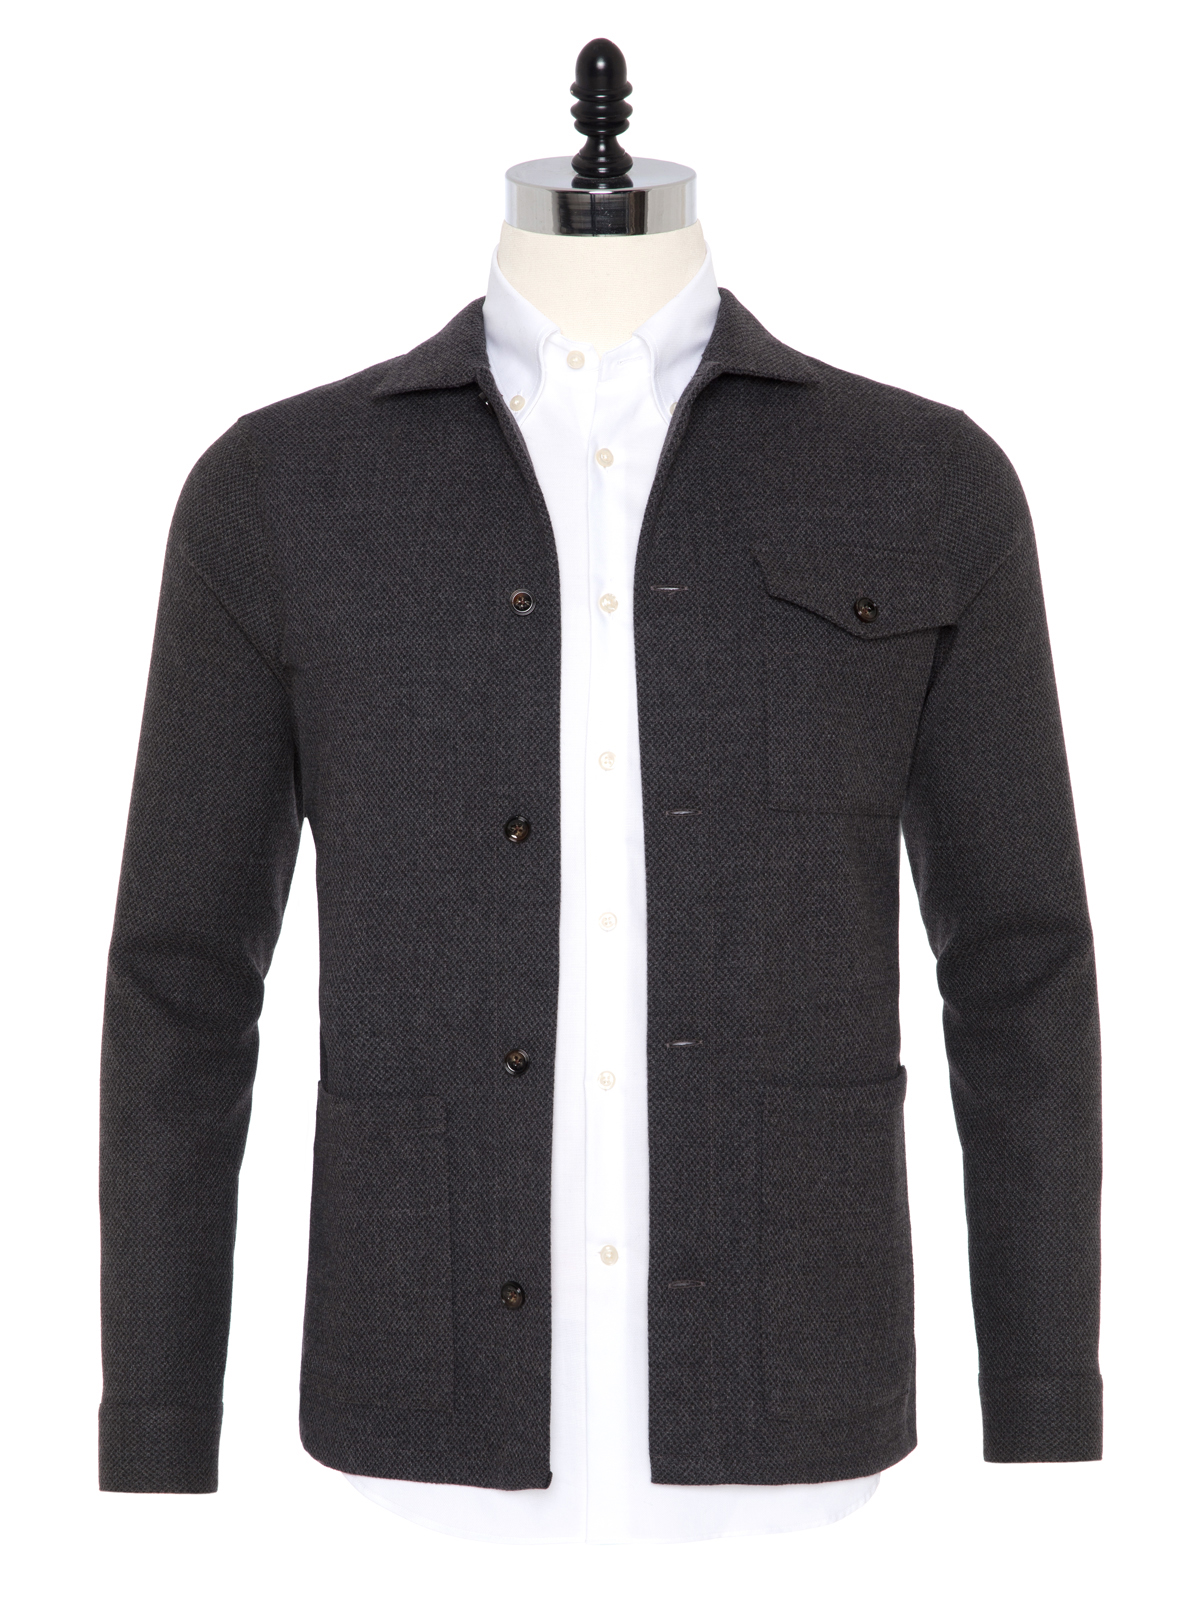 Germirli - Germirli Füme %100 Yün Tailor Fit Wool Heritage Ceket Gömlek